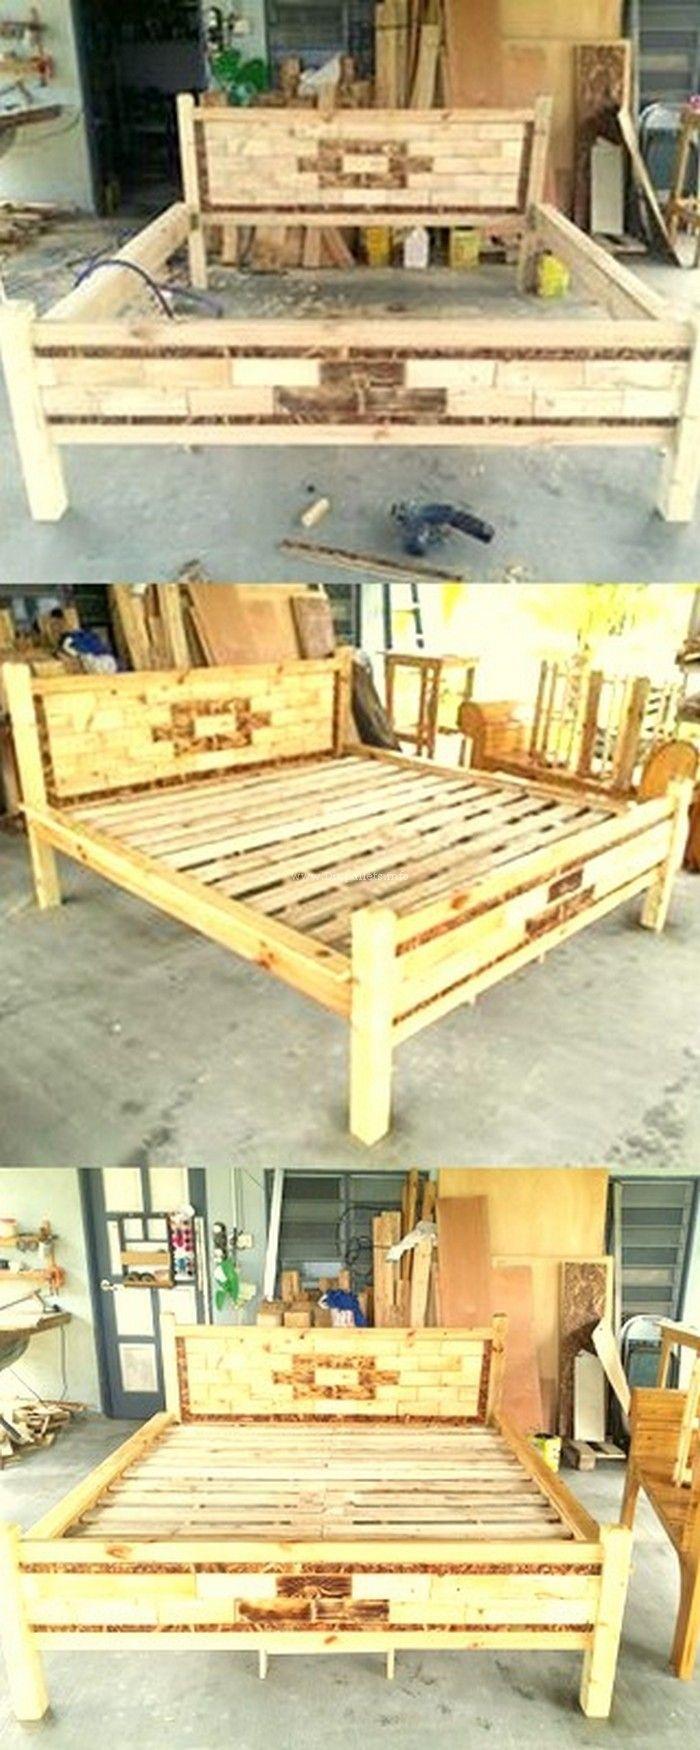 124 Best Pellets Design Images On Pinterest Woodworking Pallet  # Muebles En Fayetteville Nc